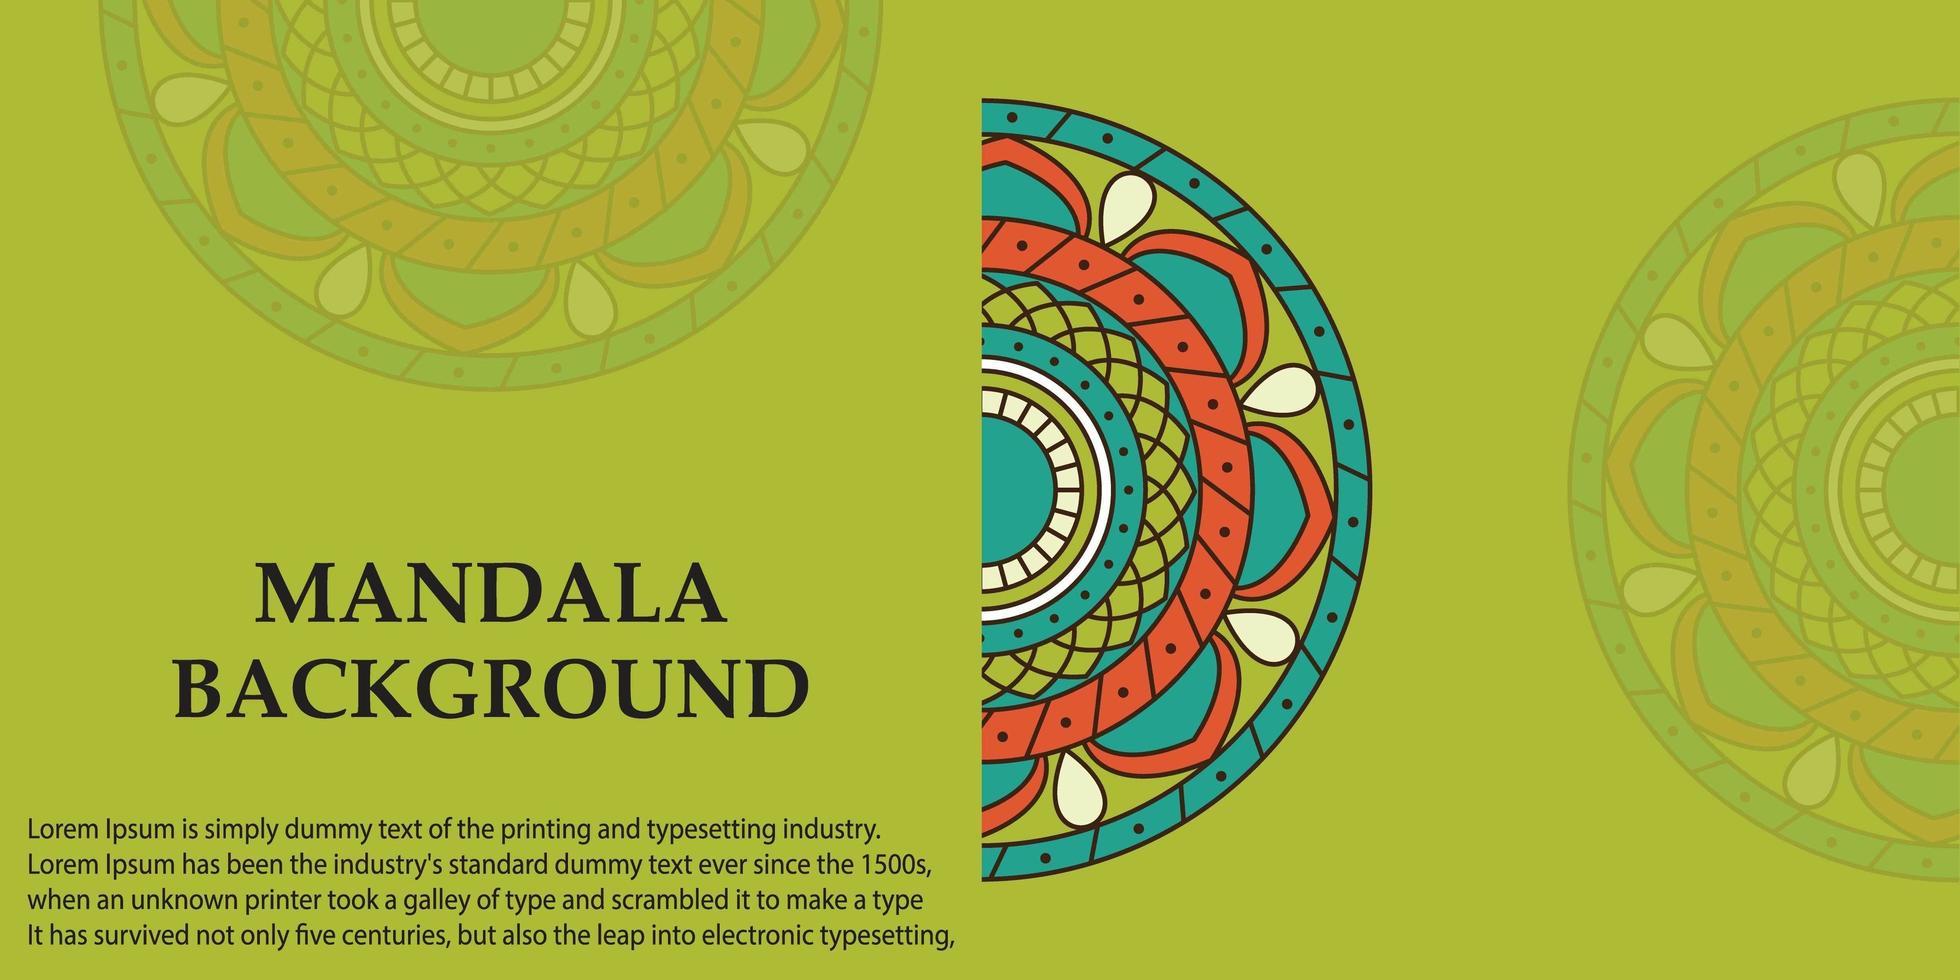 grünes, blaues und orange Mandala Design vektor